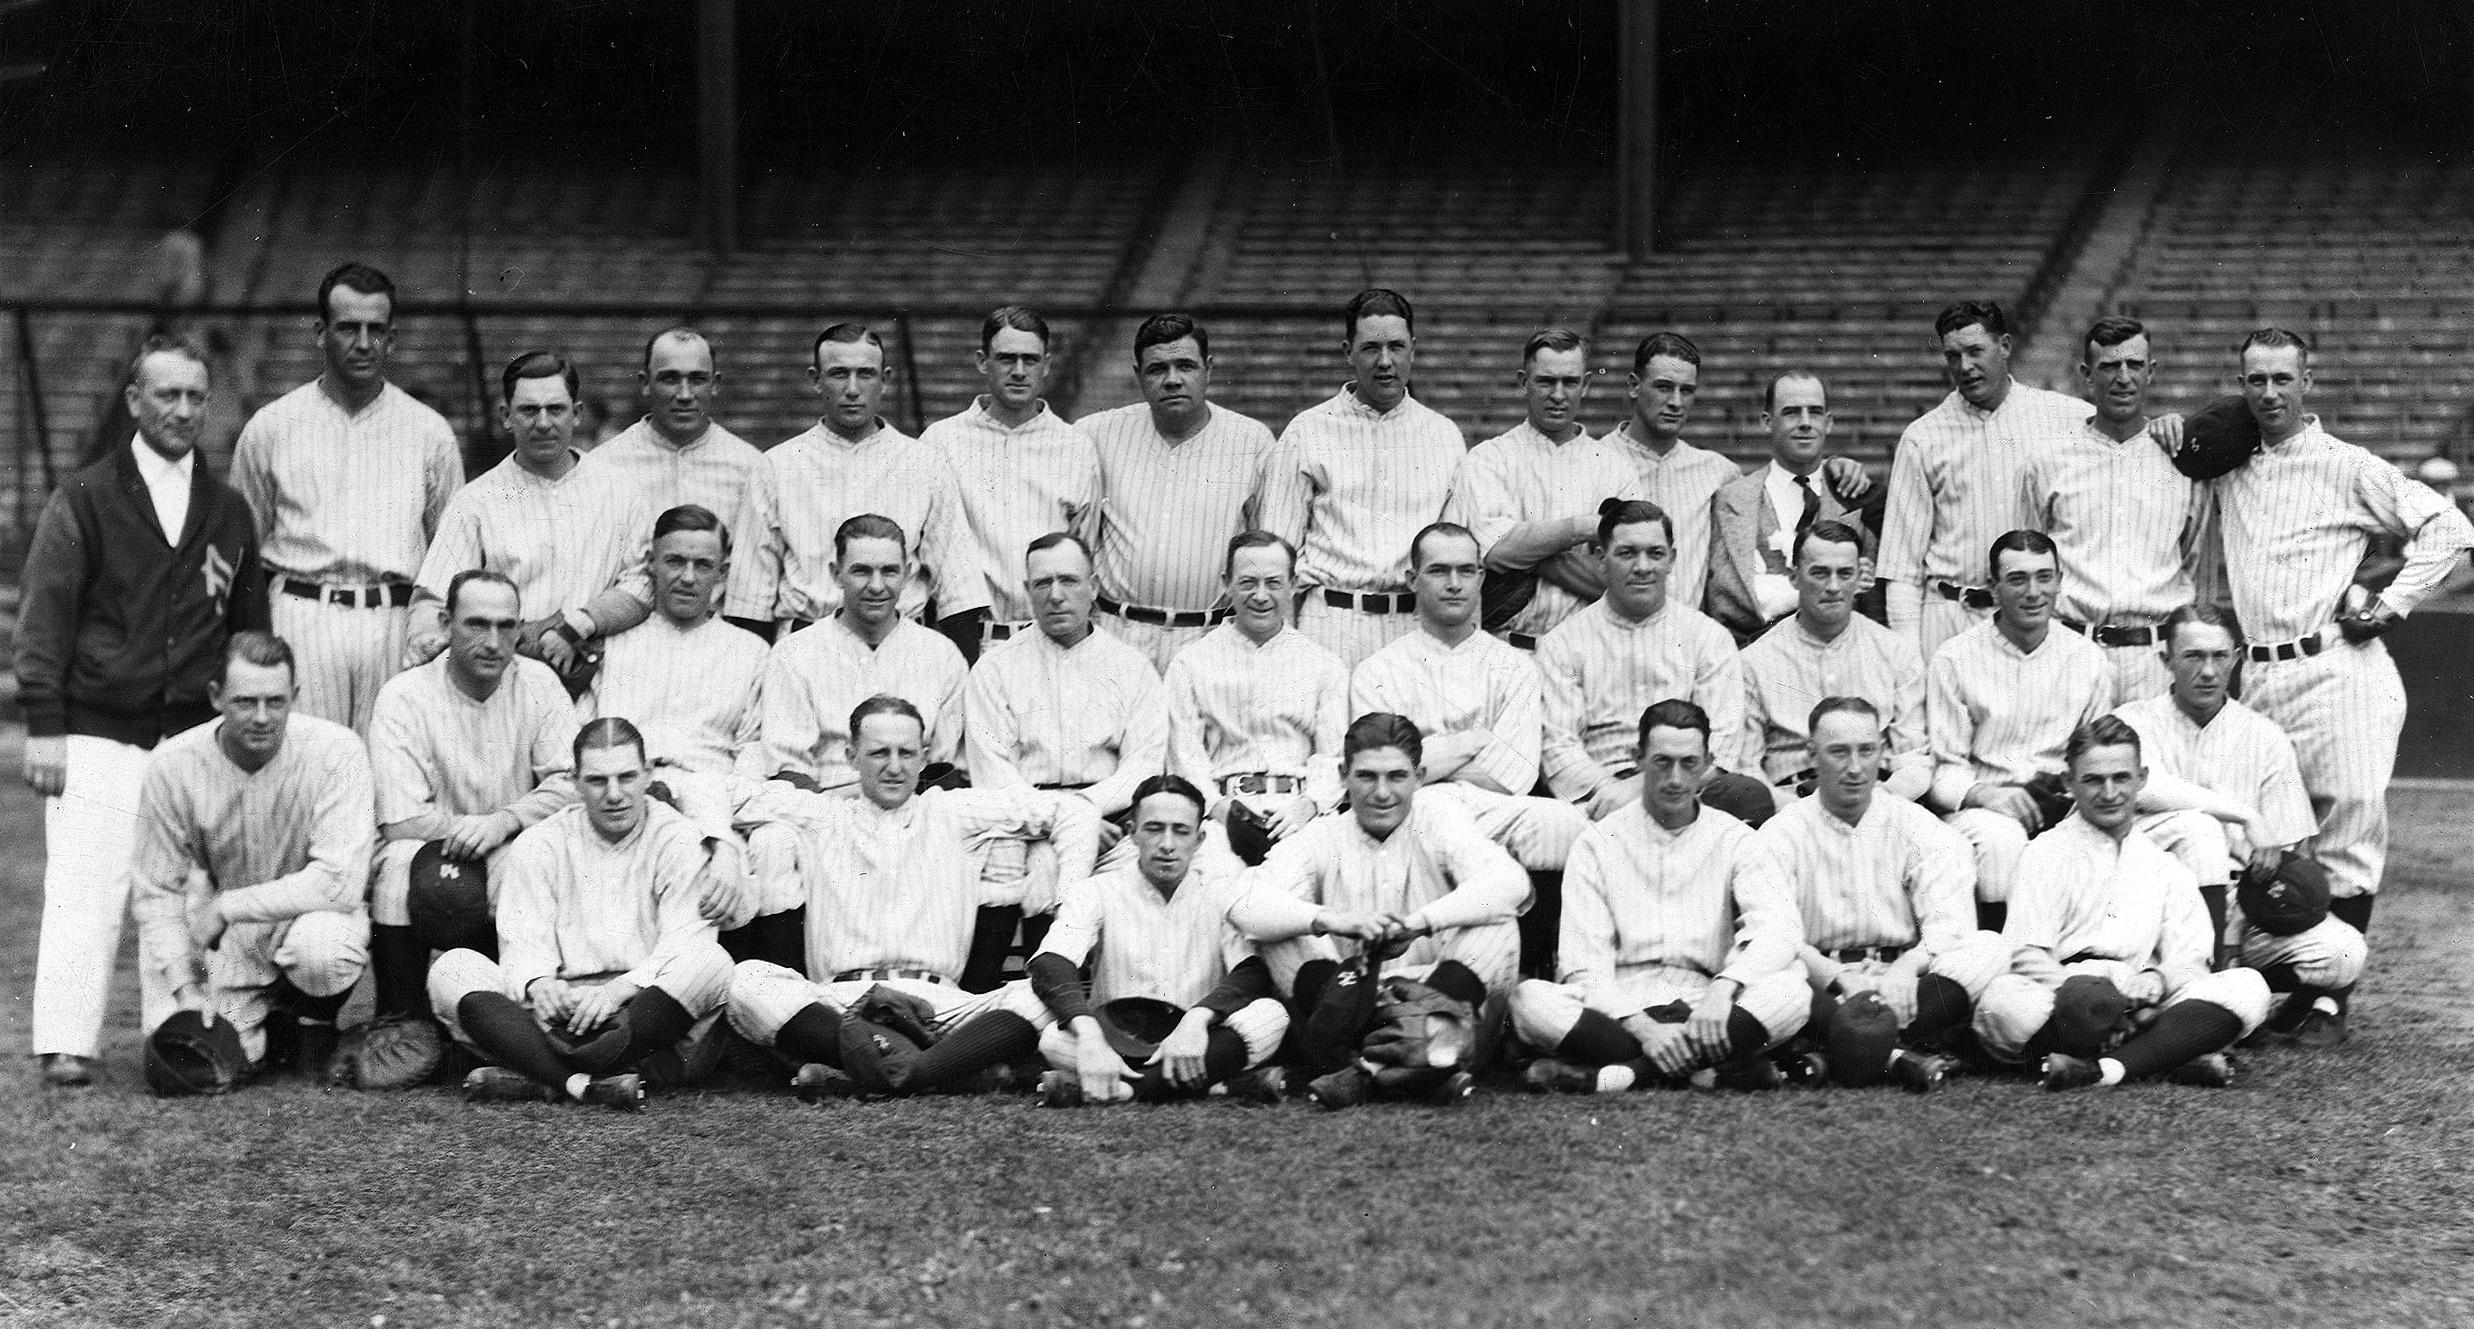 List Of American League Pennant Winners